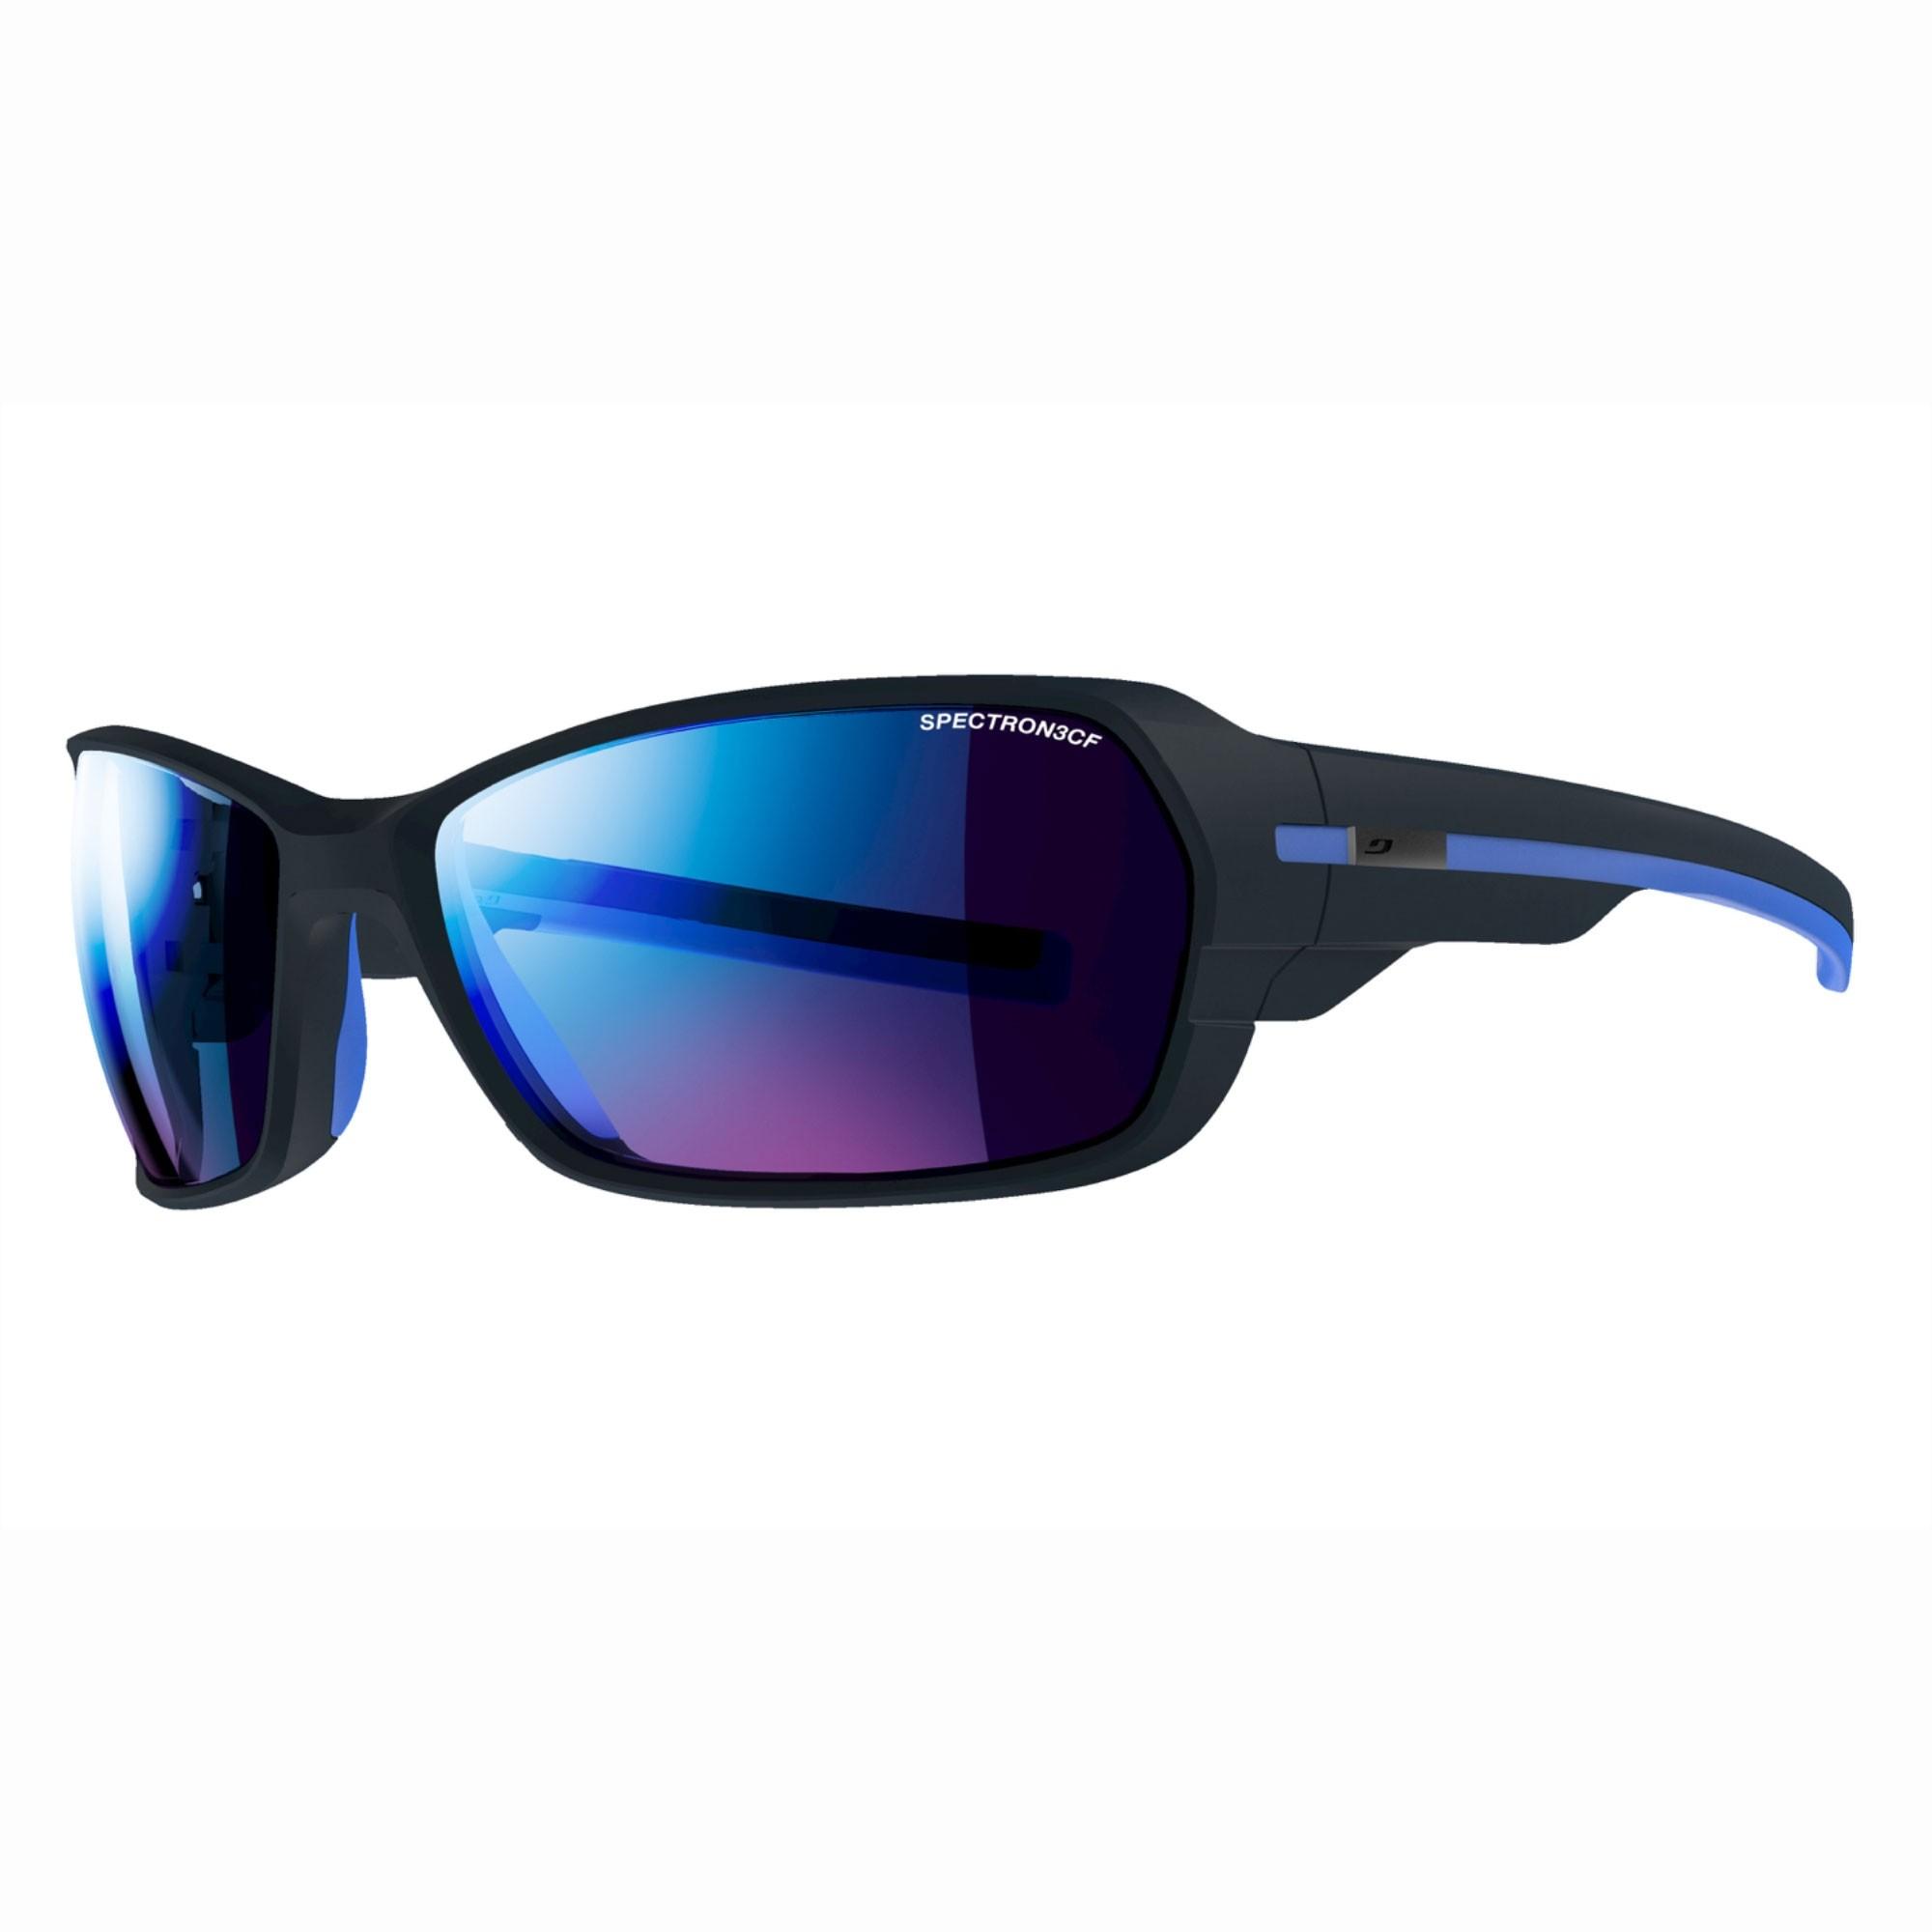 Julbo Dirt 2.0 Spectron 3CF Sunglasses Dark Blue/Blue